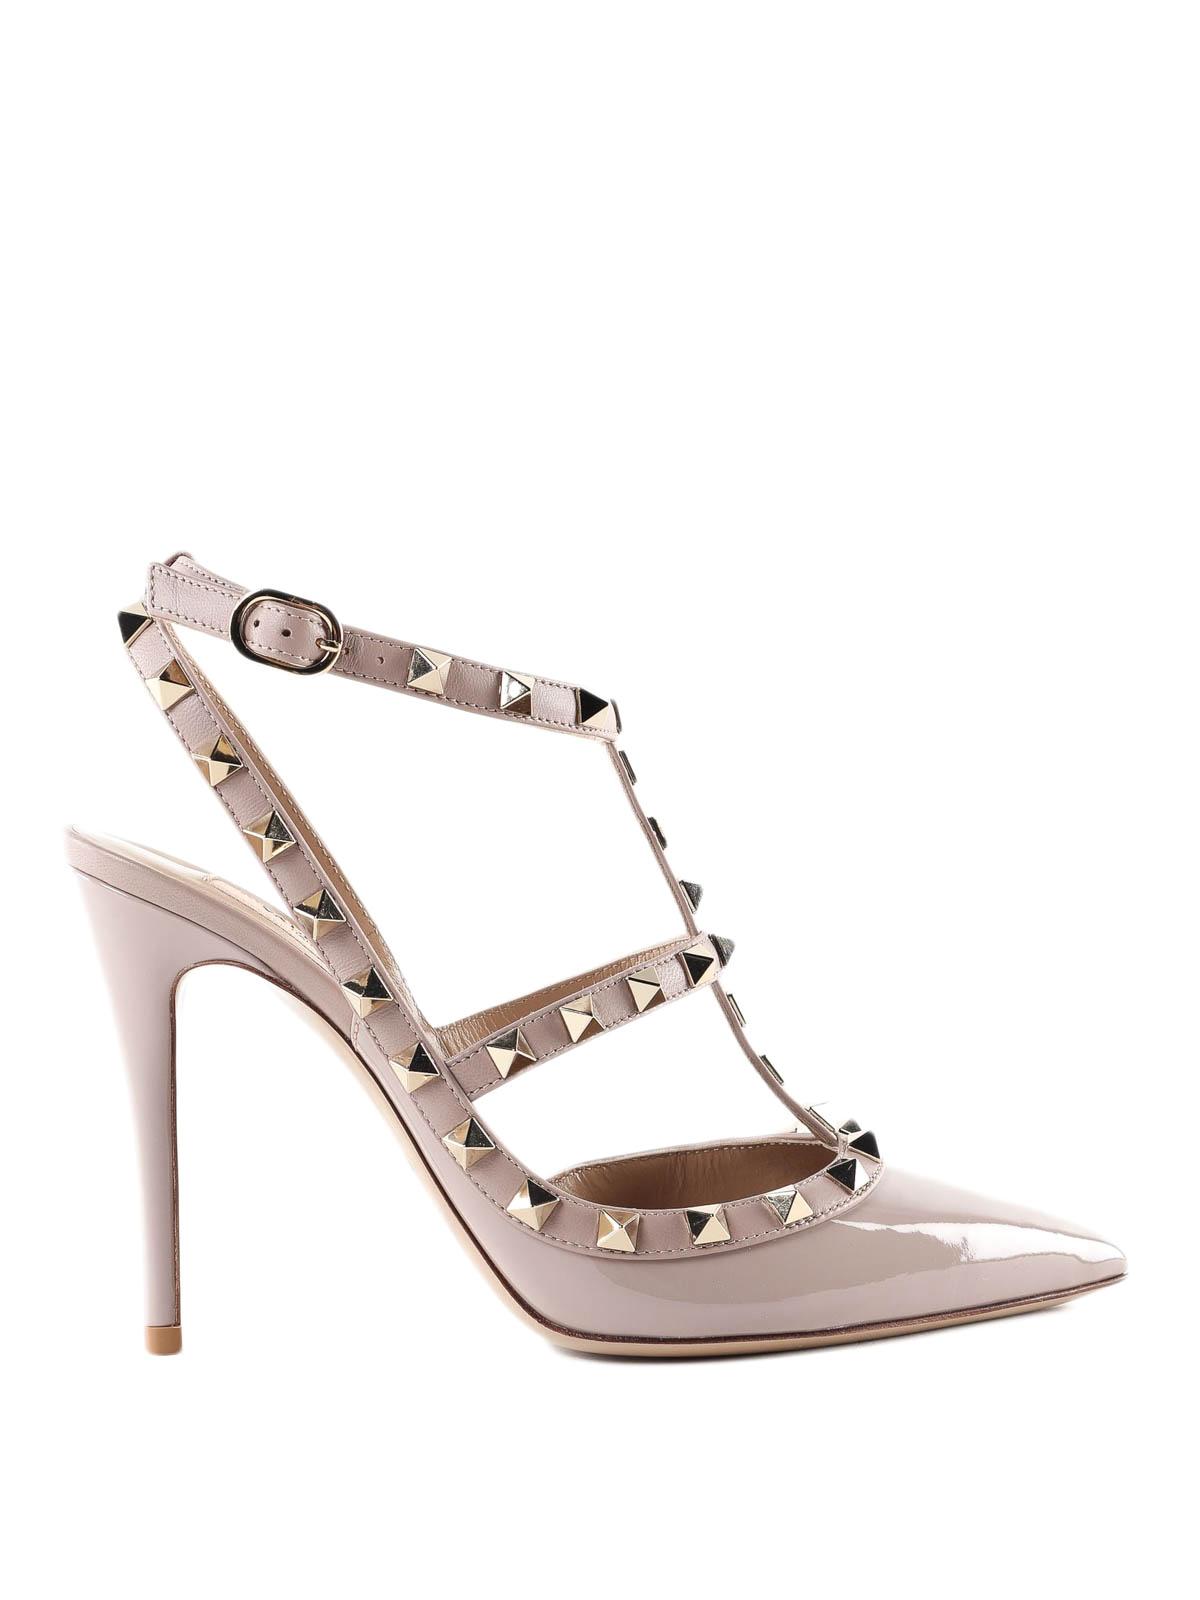 b043e31fdc4 VALENTINO GARAVANI  court shoes - Rockstud patent leather slingbacks